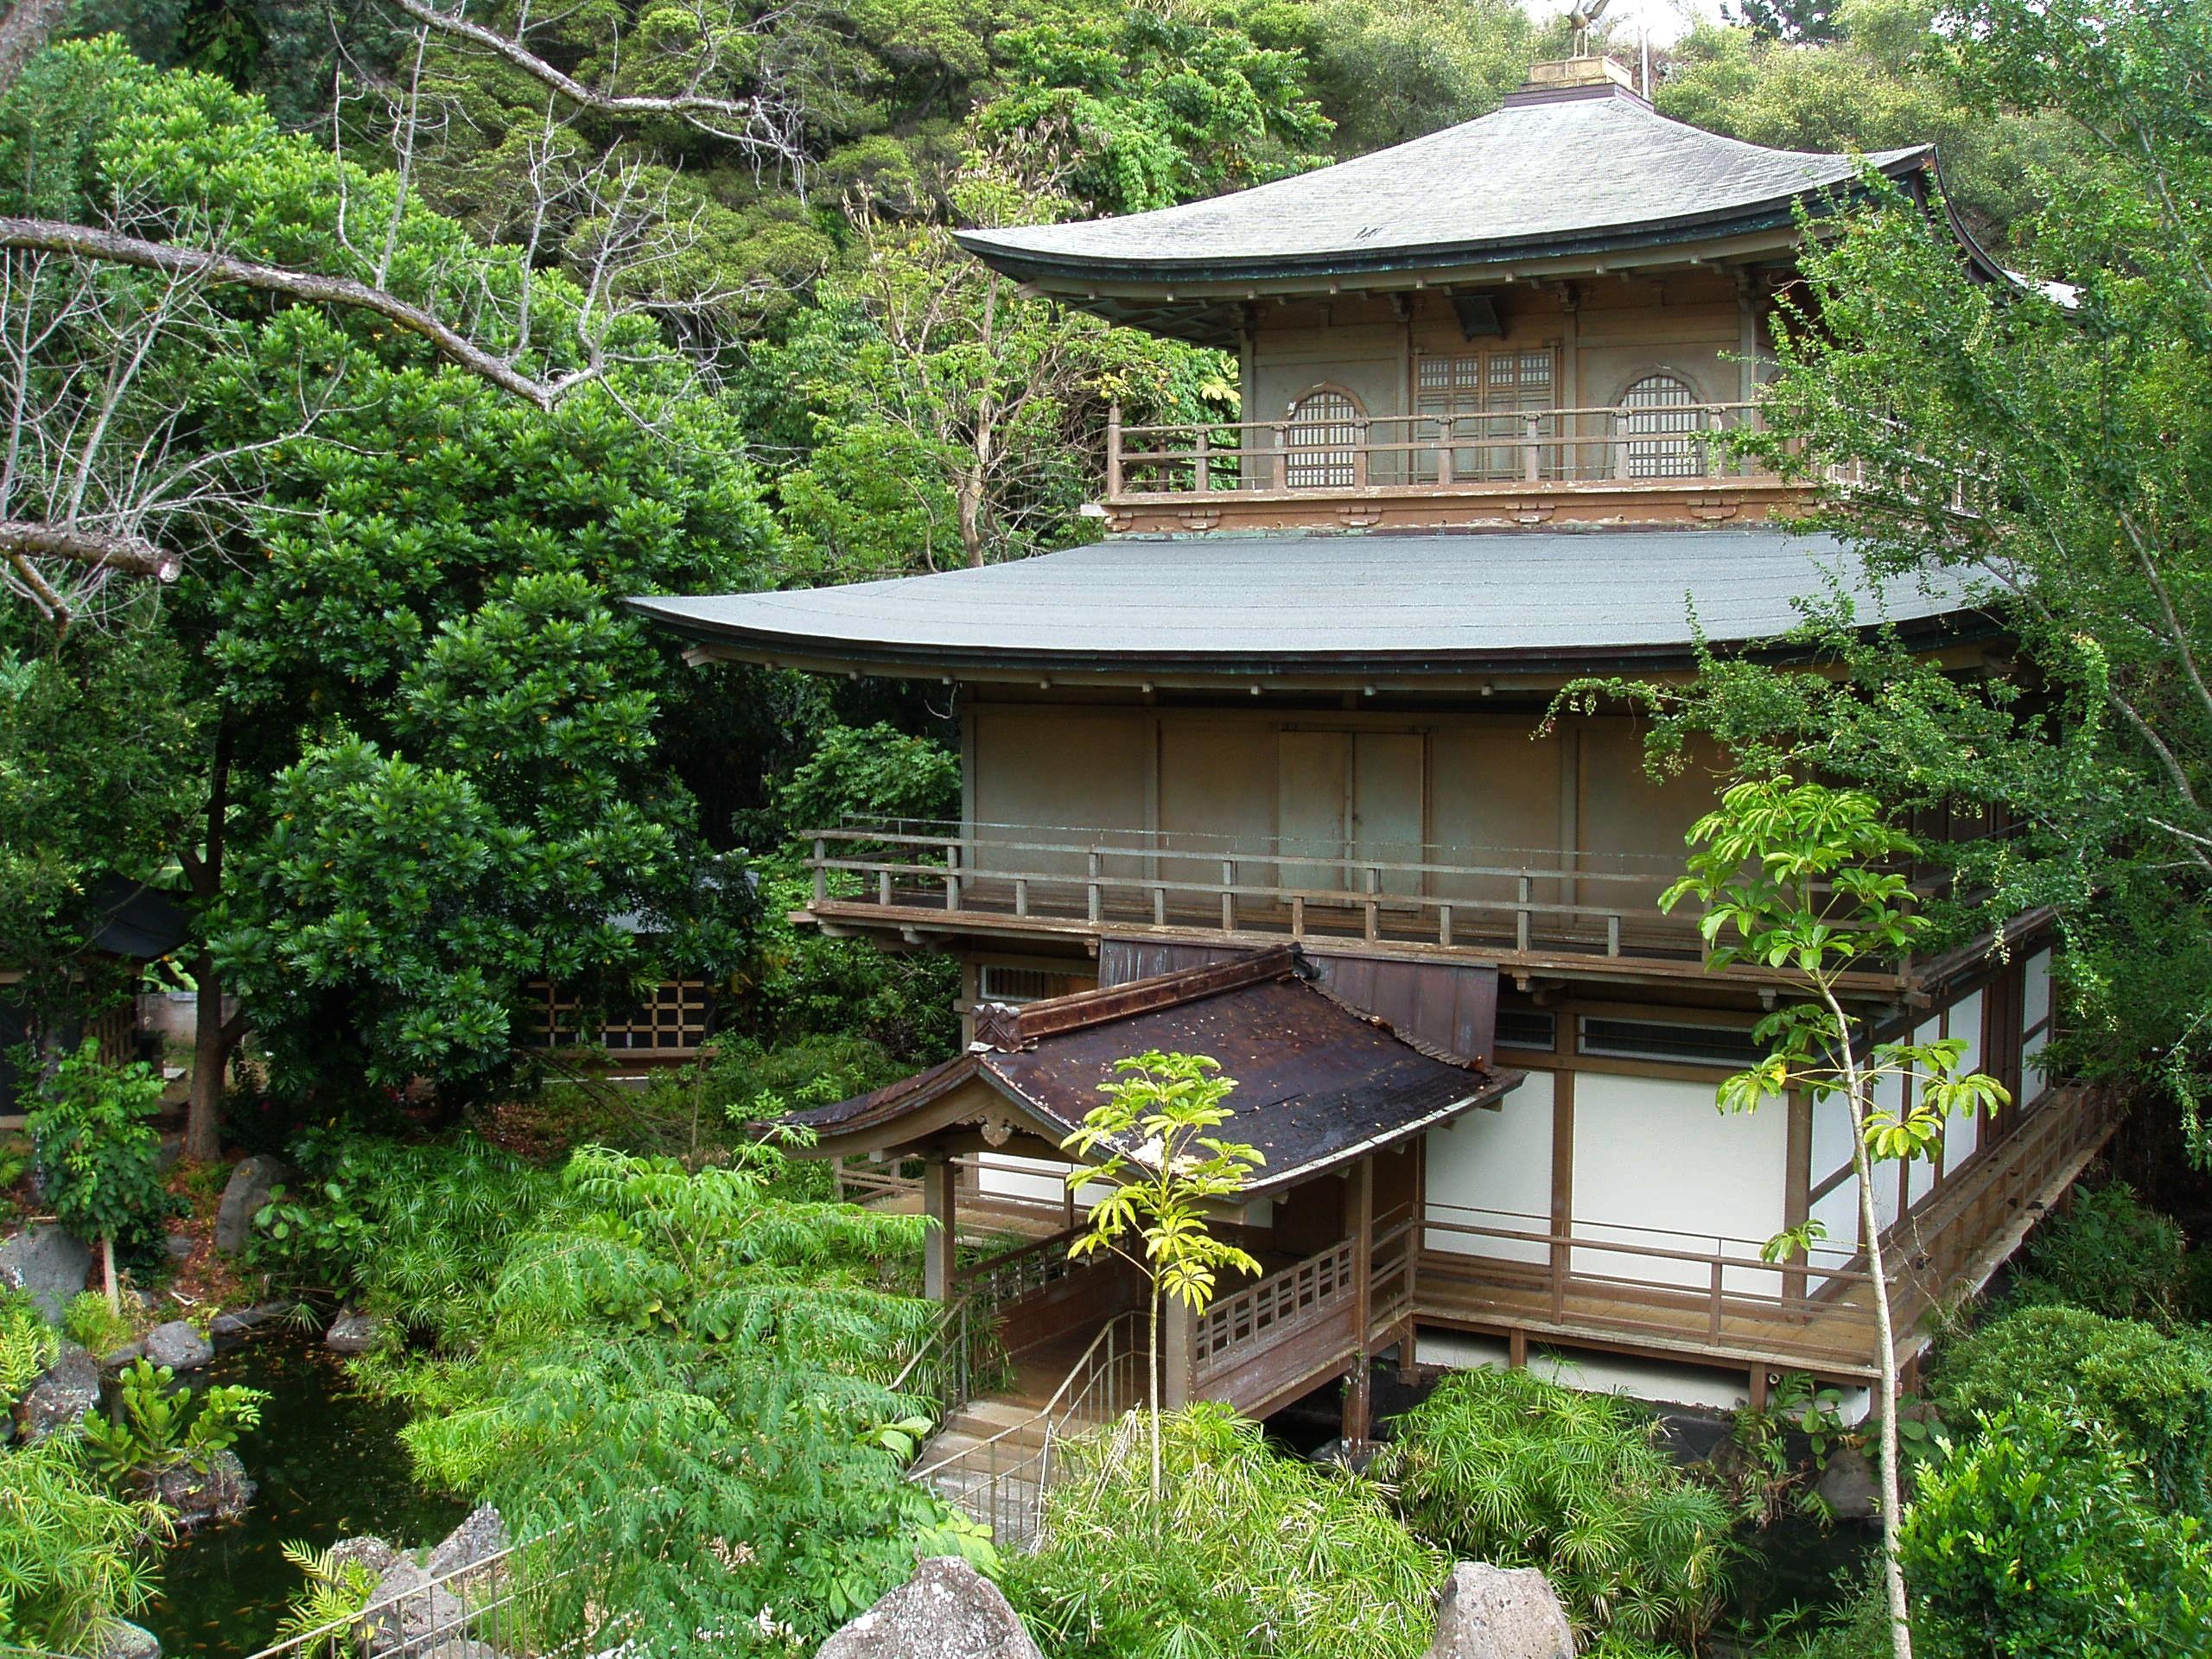 Kyoto Gardens Of Honolulu Memorial Park